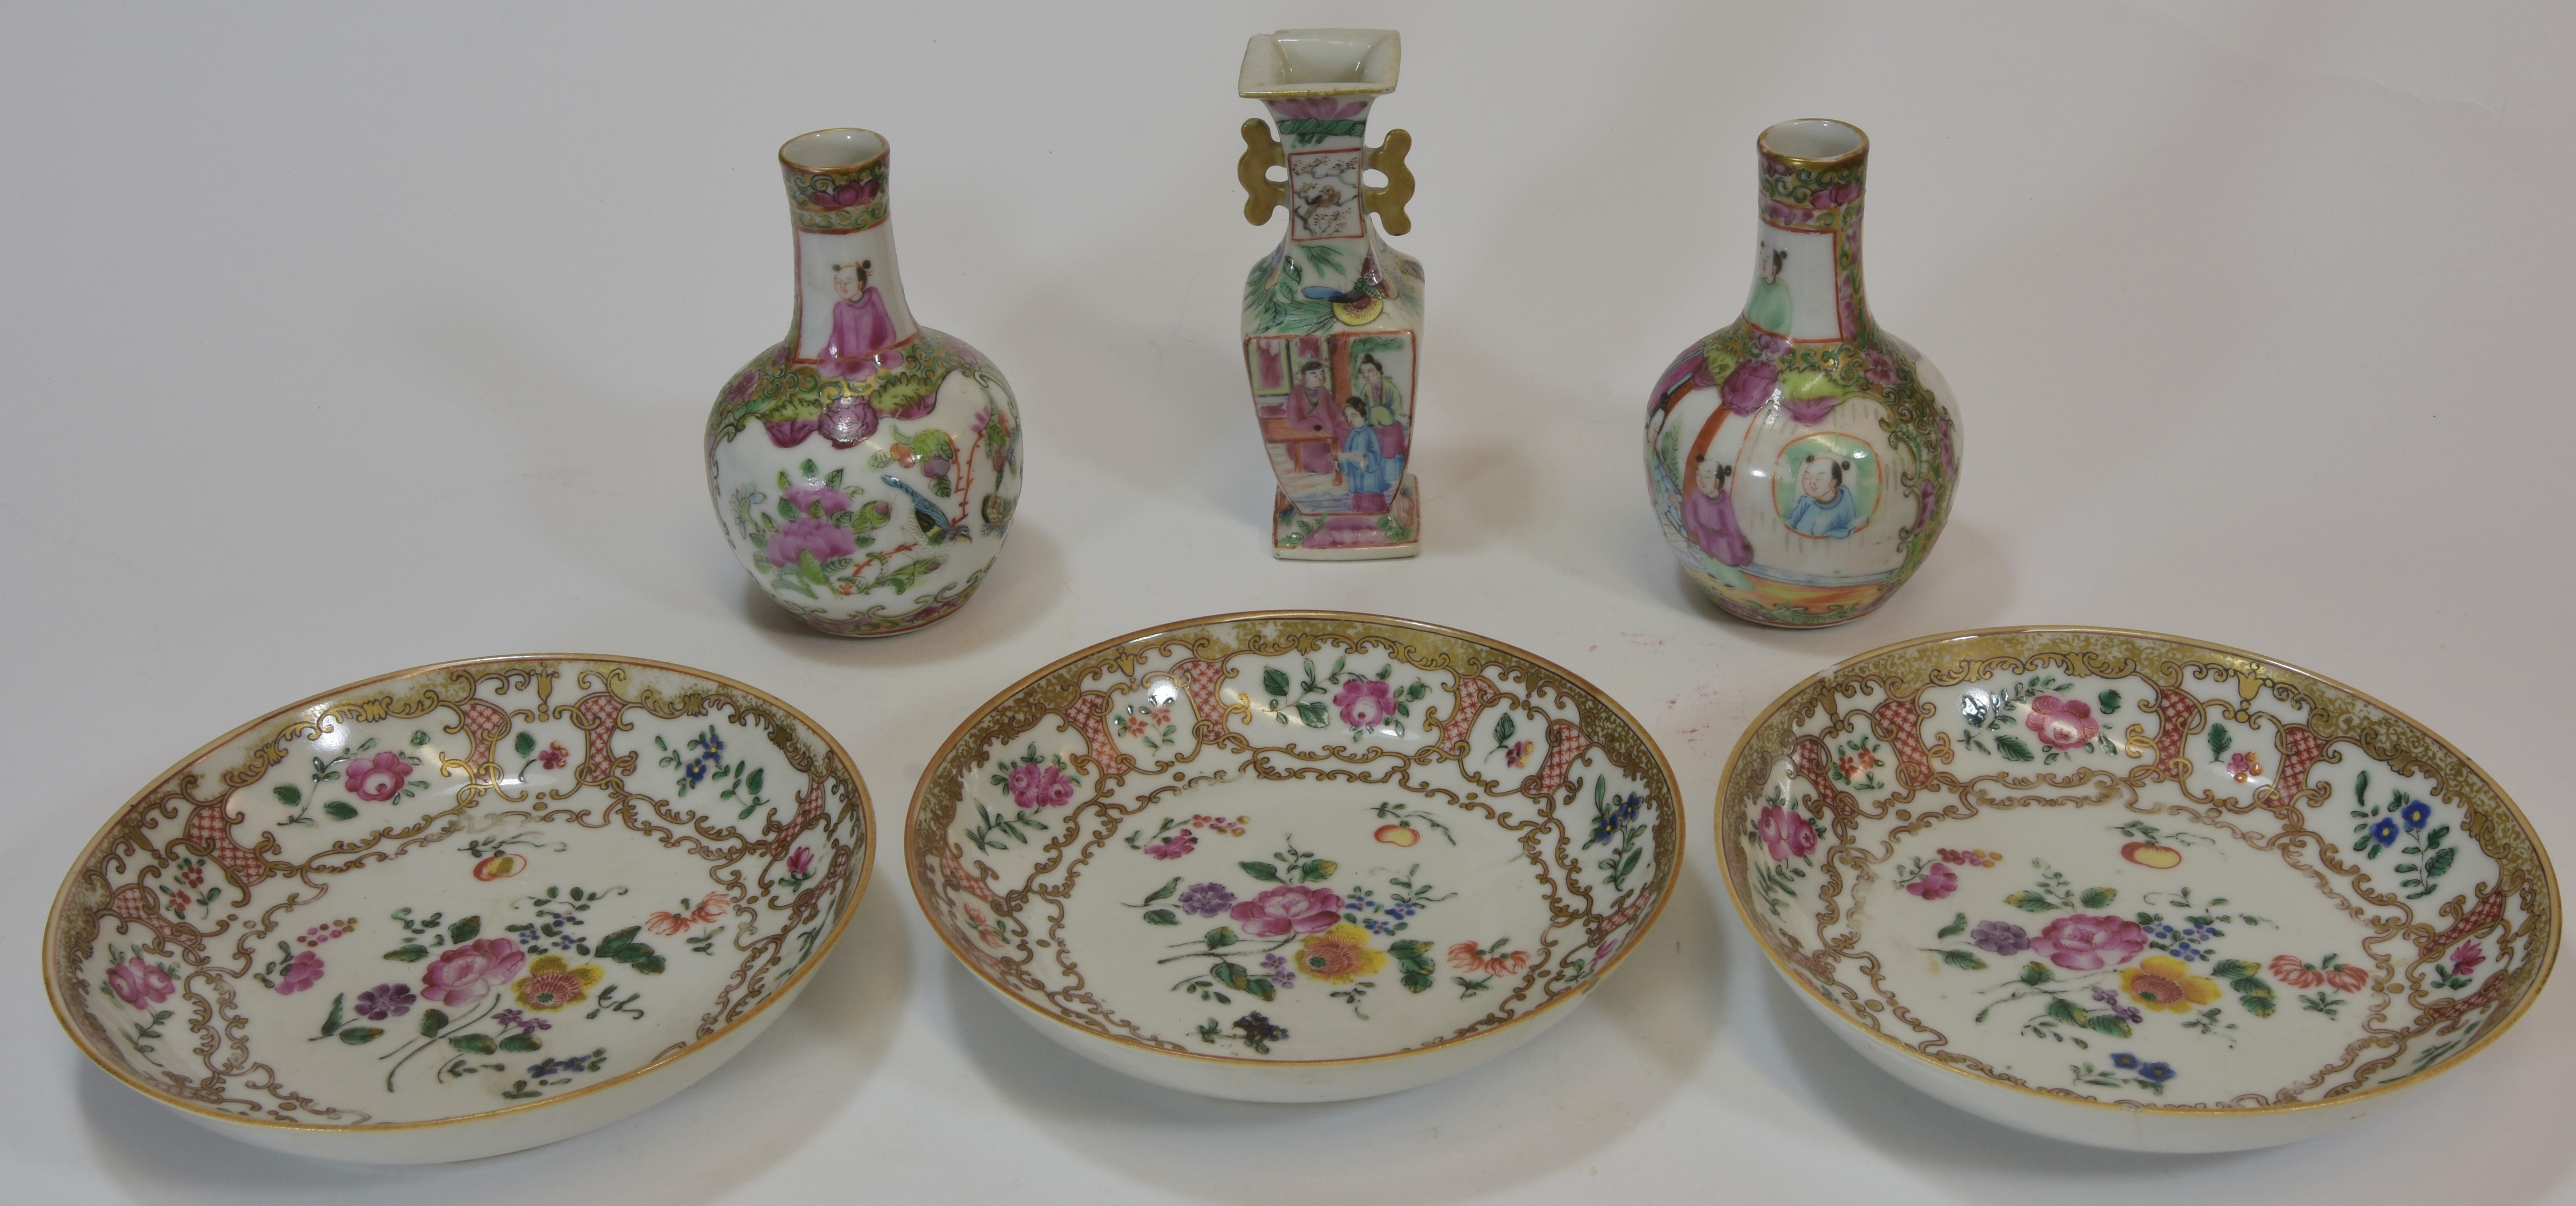 Lot 48 - A group of three 18th century dishes plus three cantonese vases 14cm 十八世紀或遲 瓷器陸件